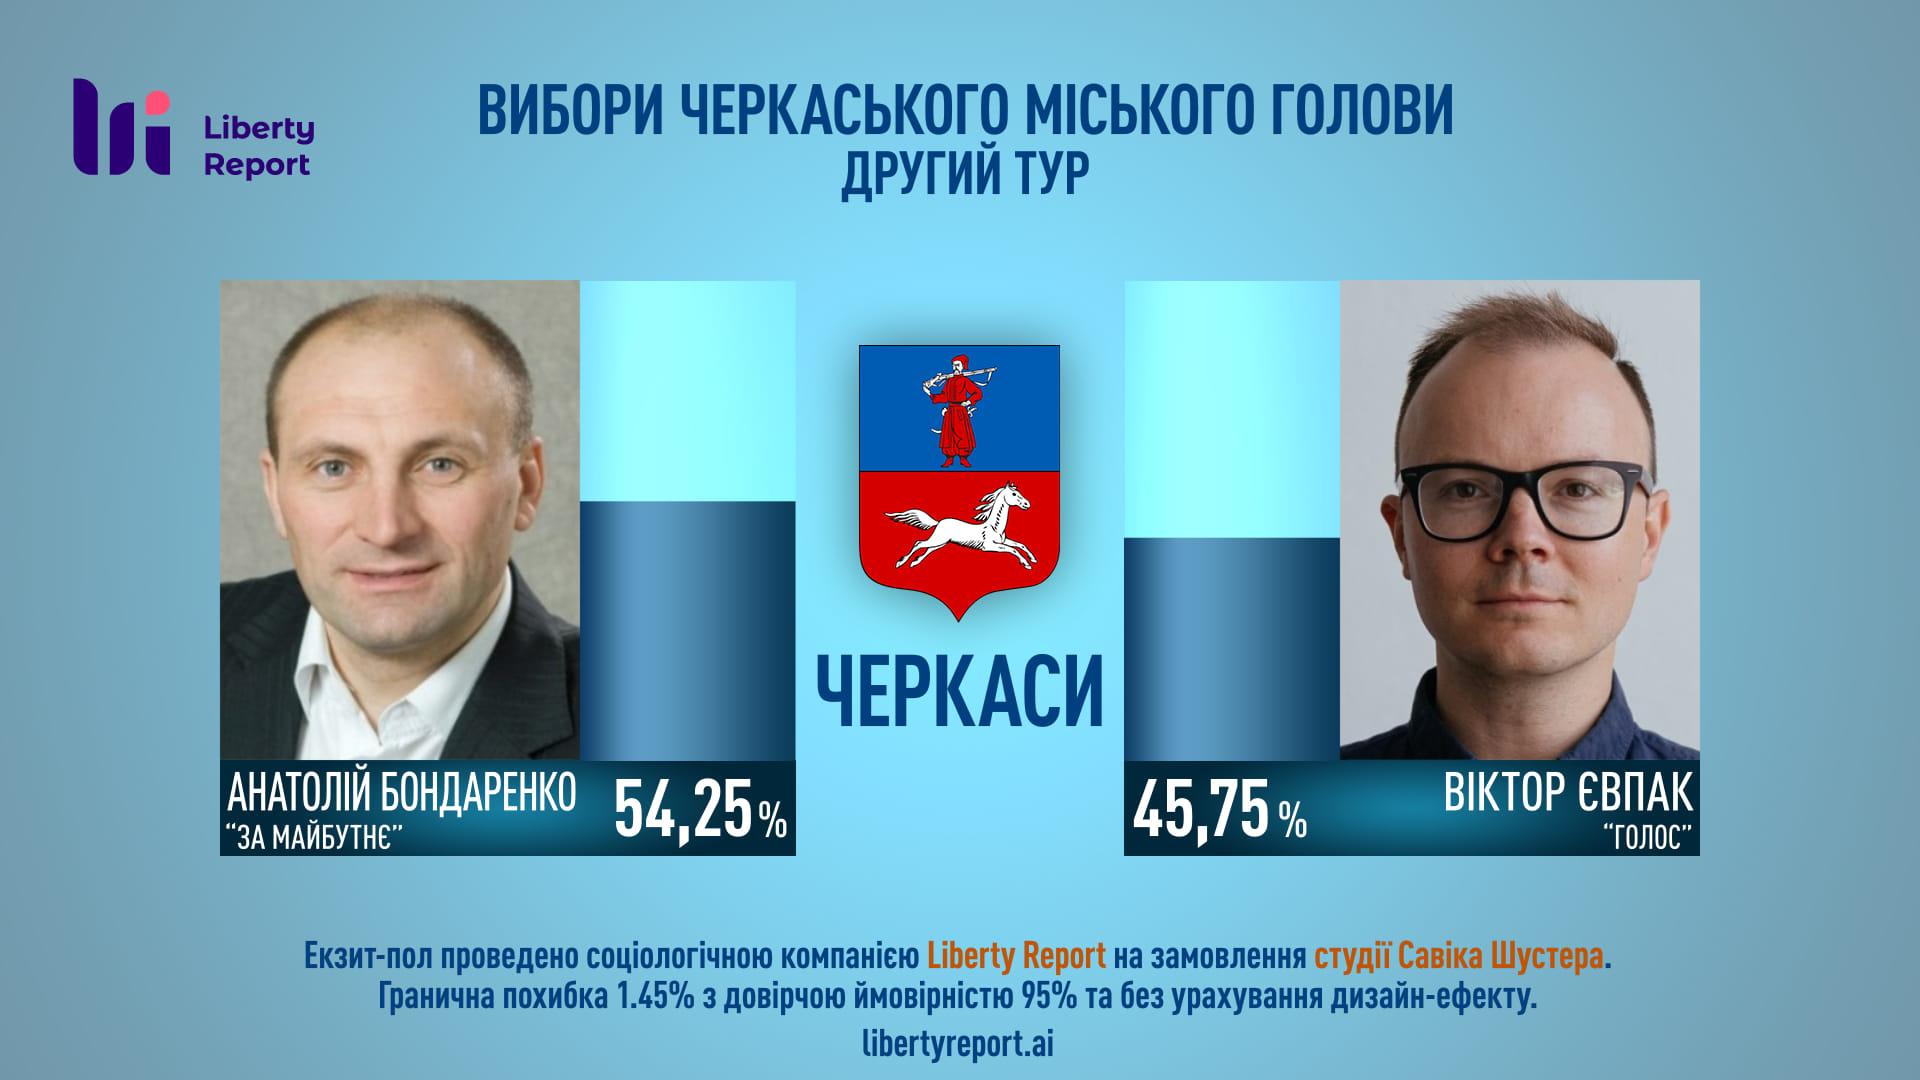 https://img.pravda.com/images/doc/1/f/1f28f0b-exitpoll-cherkasy-2-tur-original.jpg